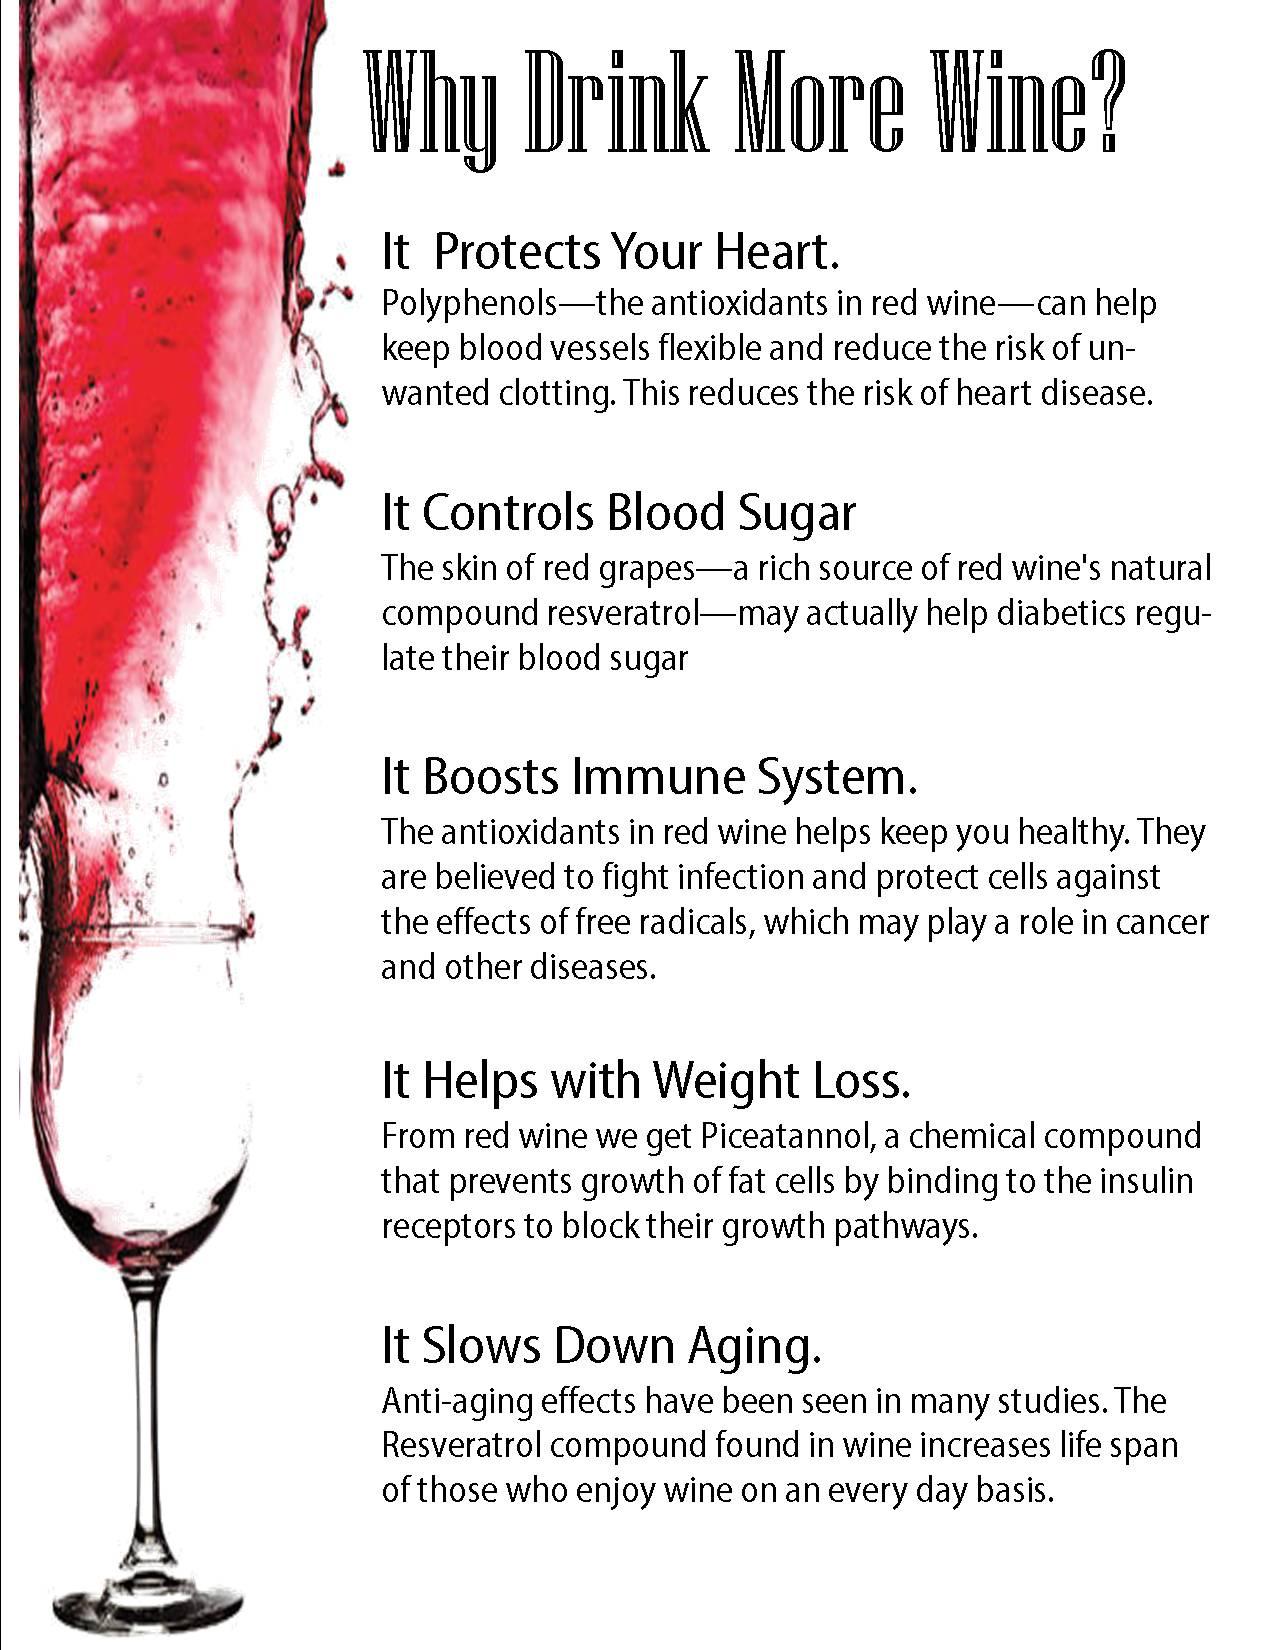 wine-display-info-2.jpg